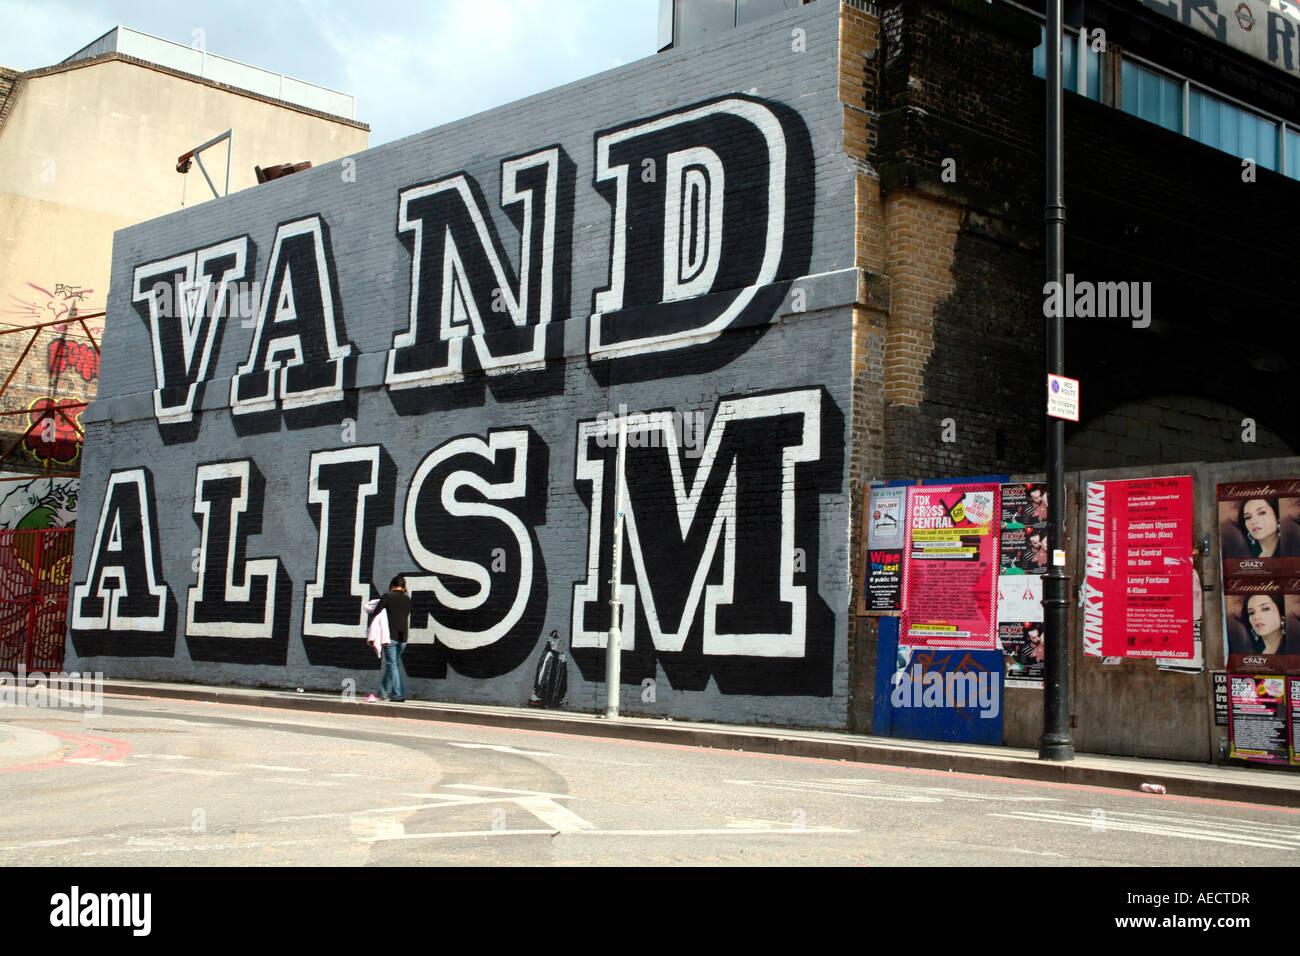 Vandalism mural by EINE, Shoreditch, London - Stock Image